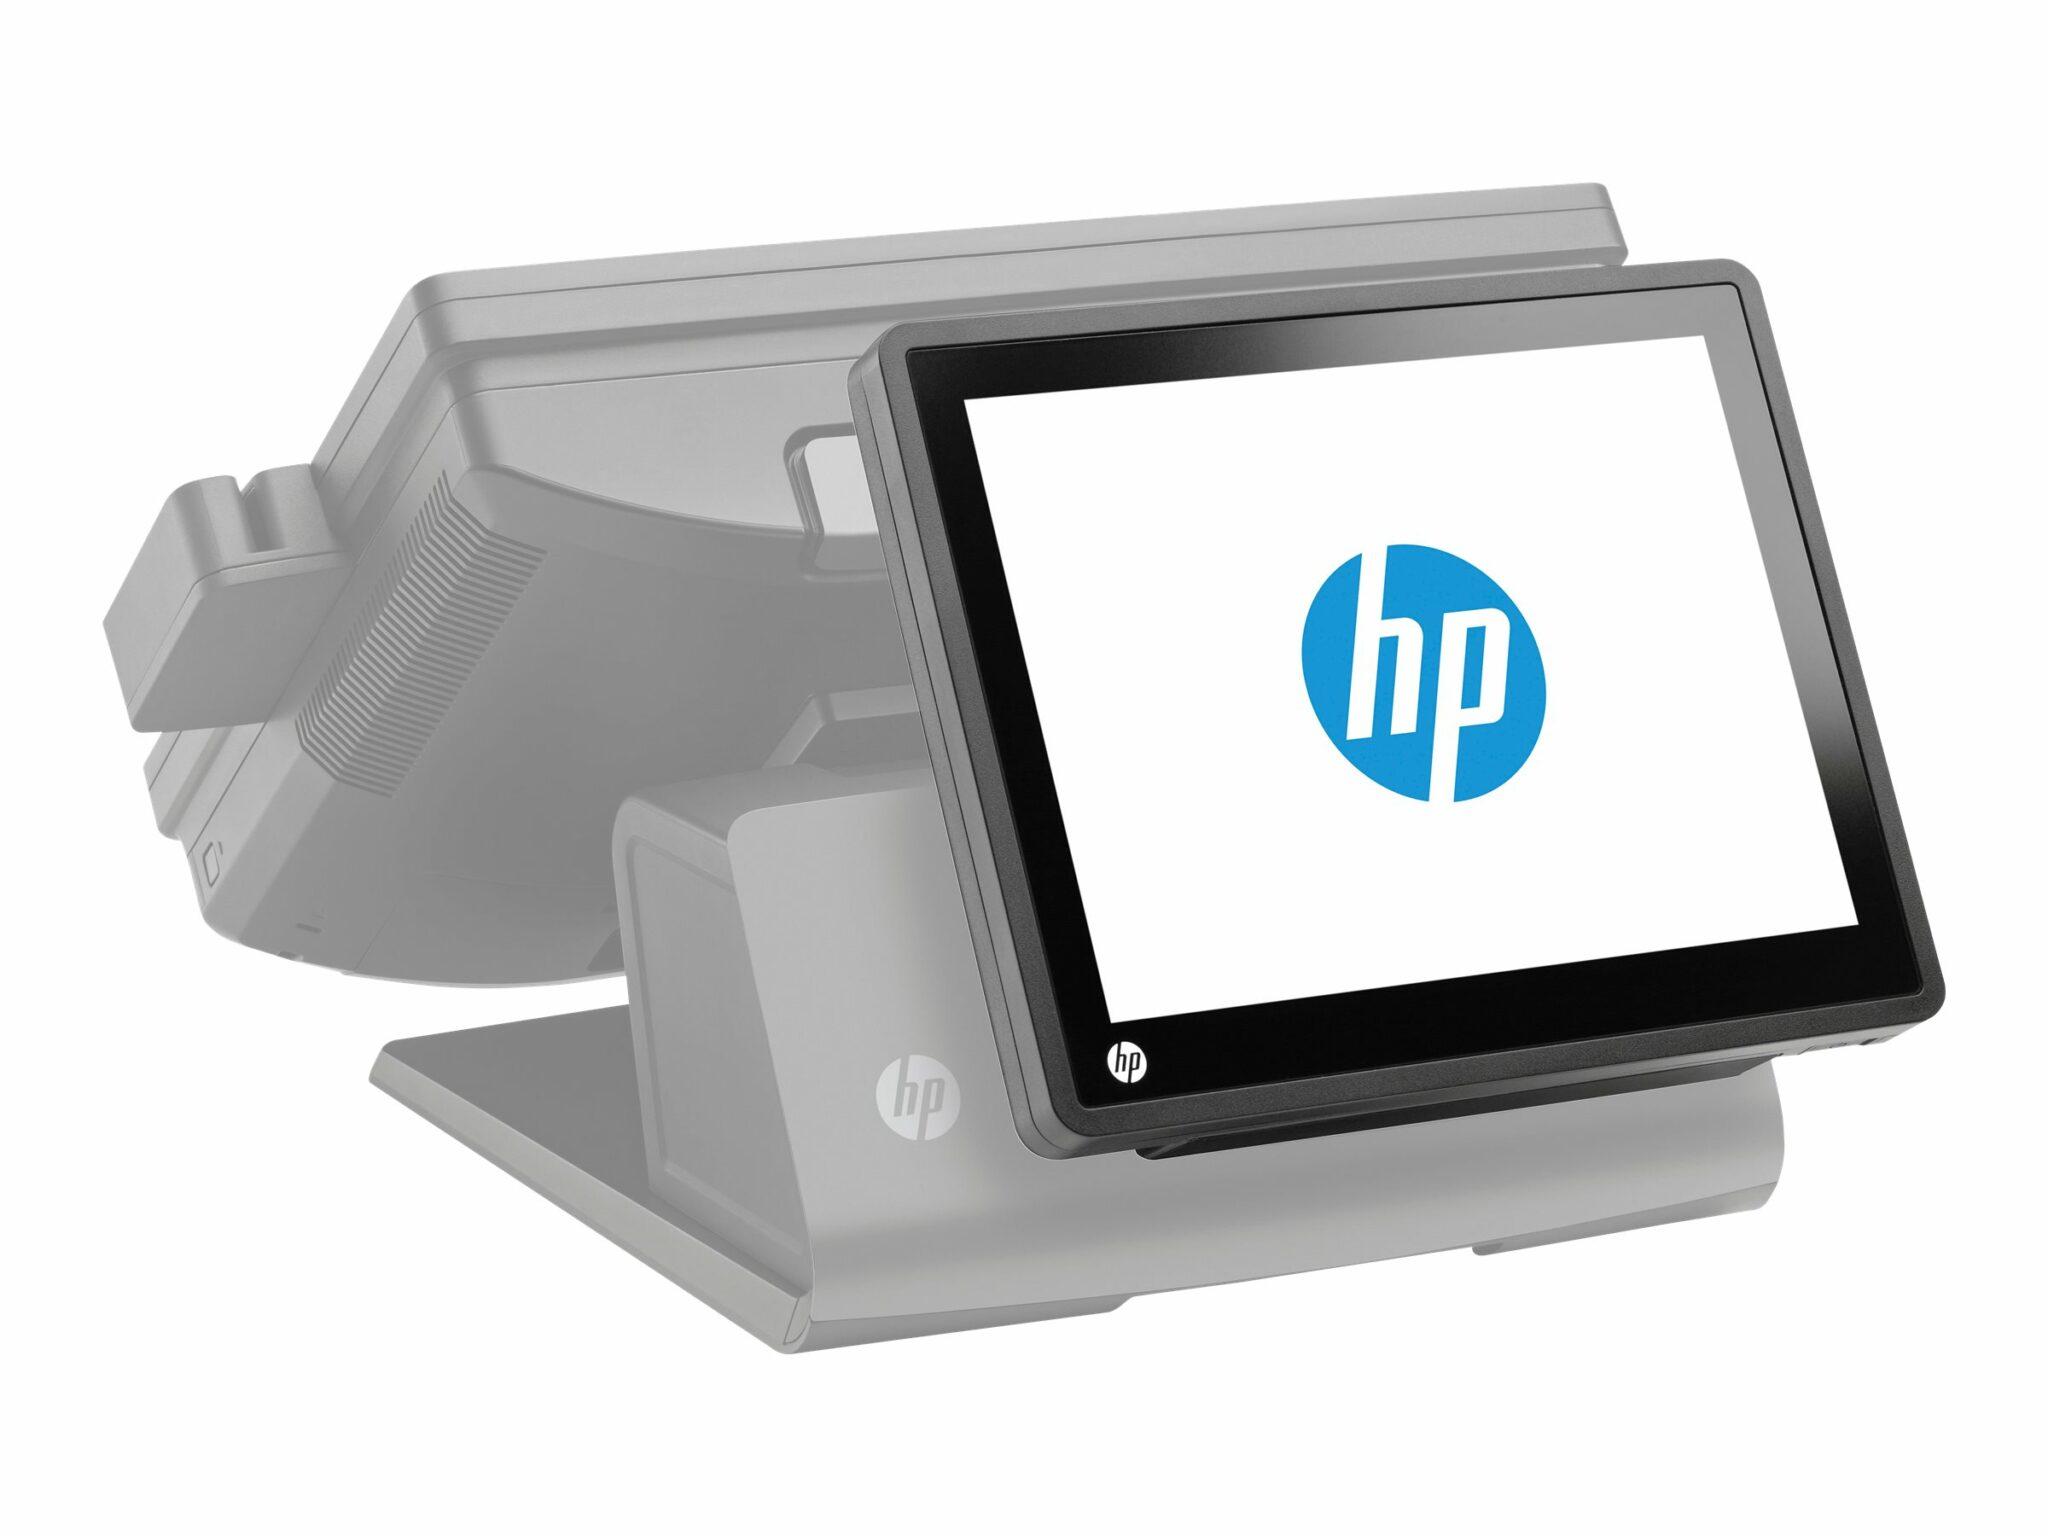 SBUY HP PROMO RP7 10.4 inch CFD Display